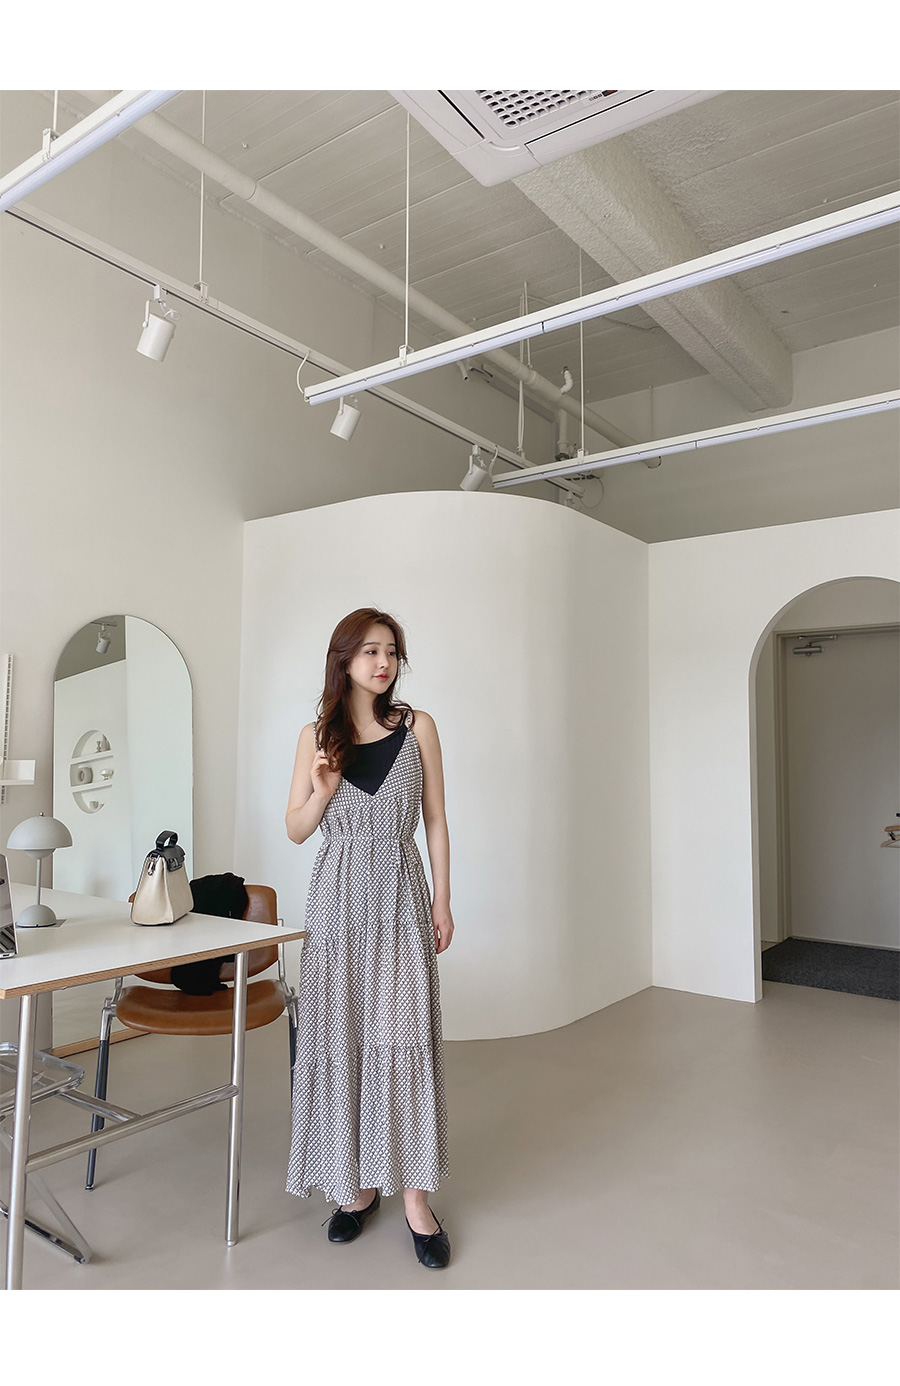 Big Size 55-88 Maracas Long Sleeveless Dress